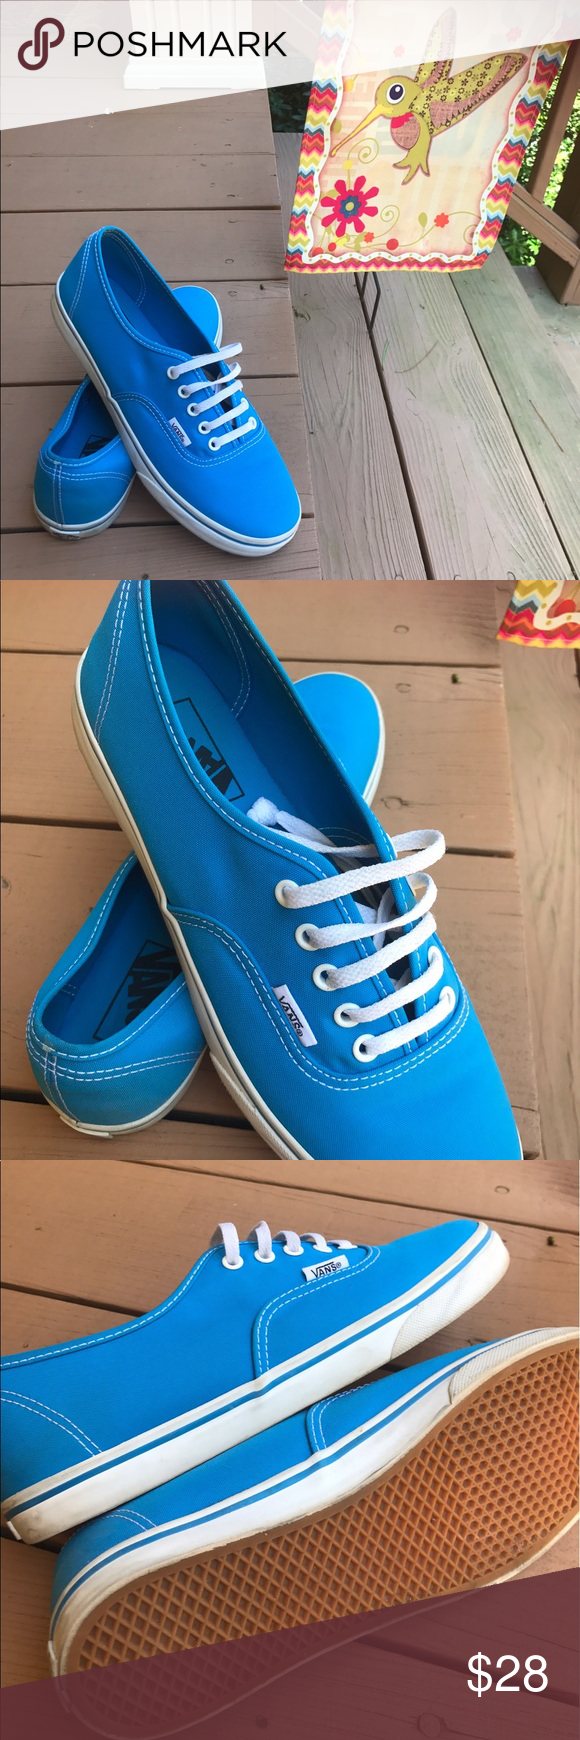 Caribbean Blue Vans | Blue vans, Vans